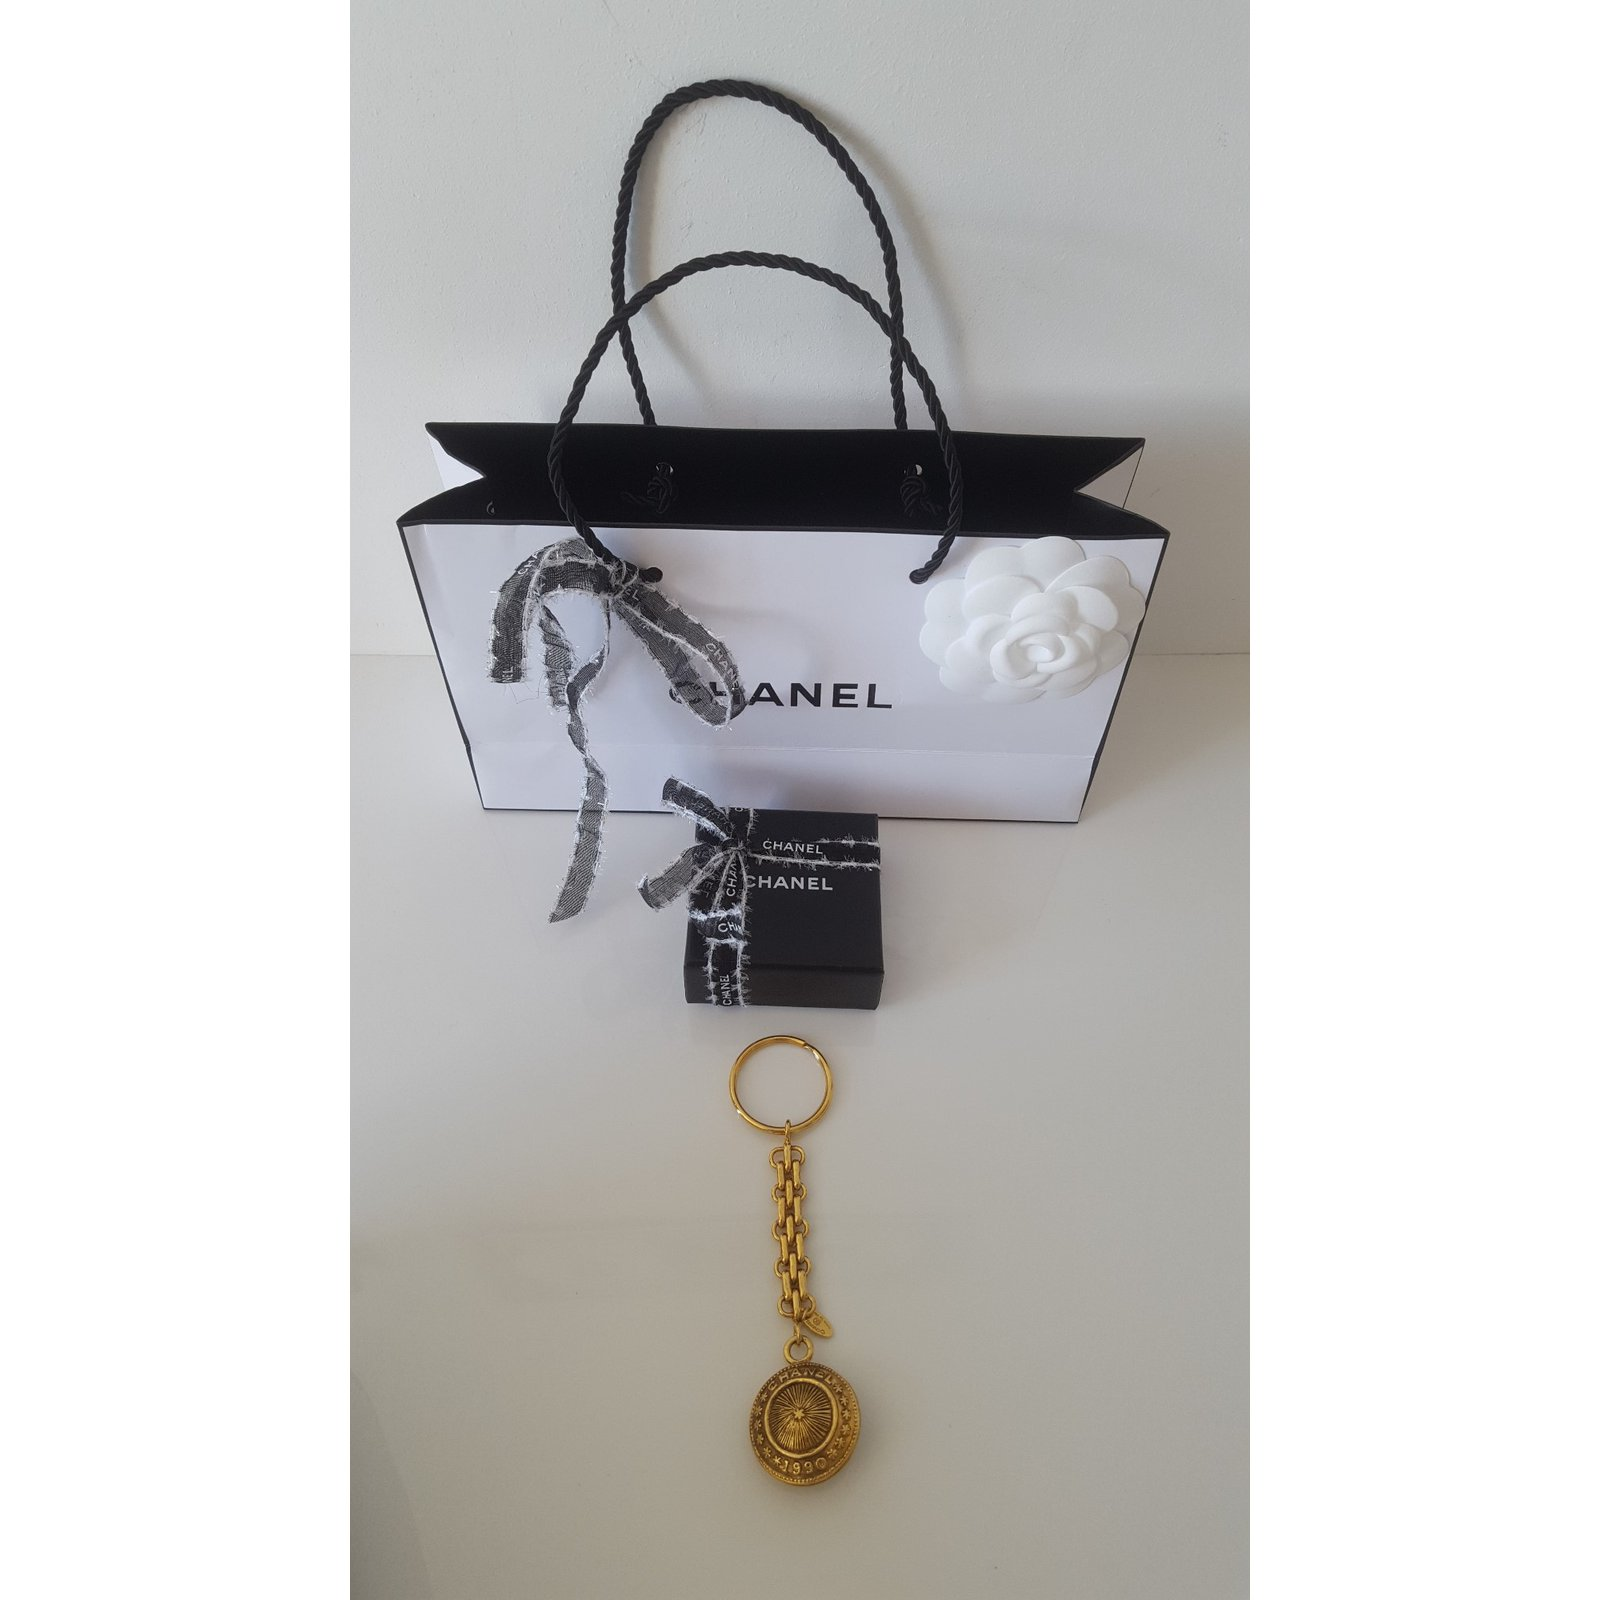 Great Chanel Vintage Keychain Bag Jewel Purses Wallets Cases Metal